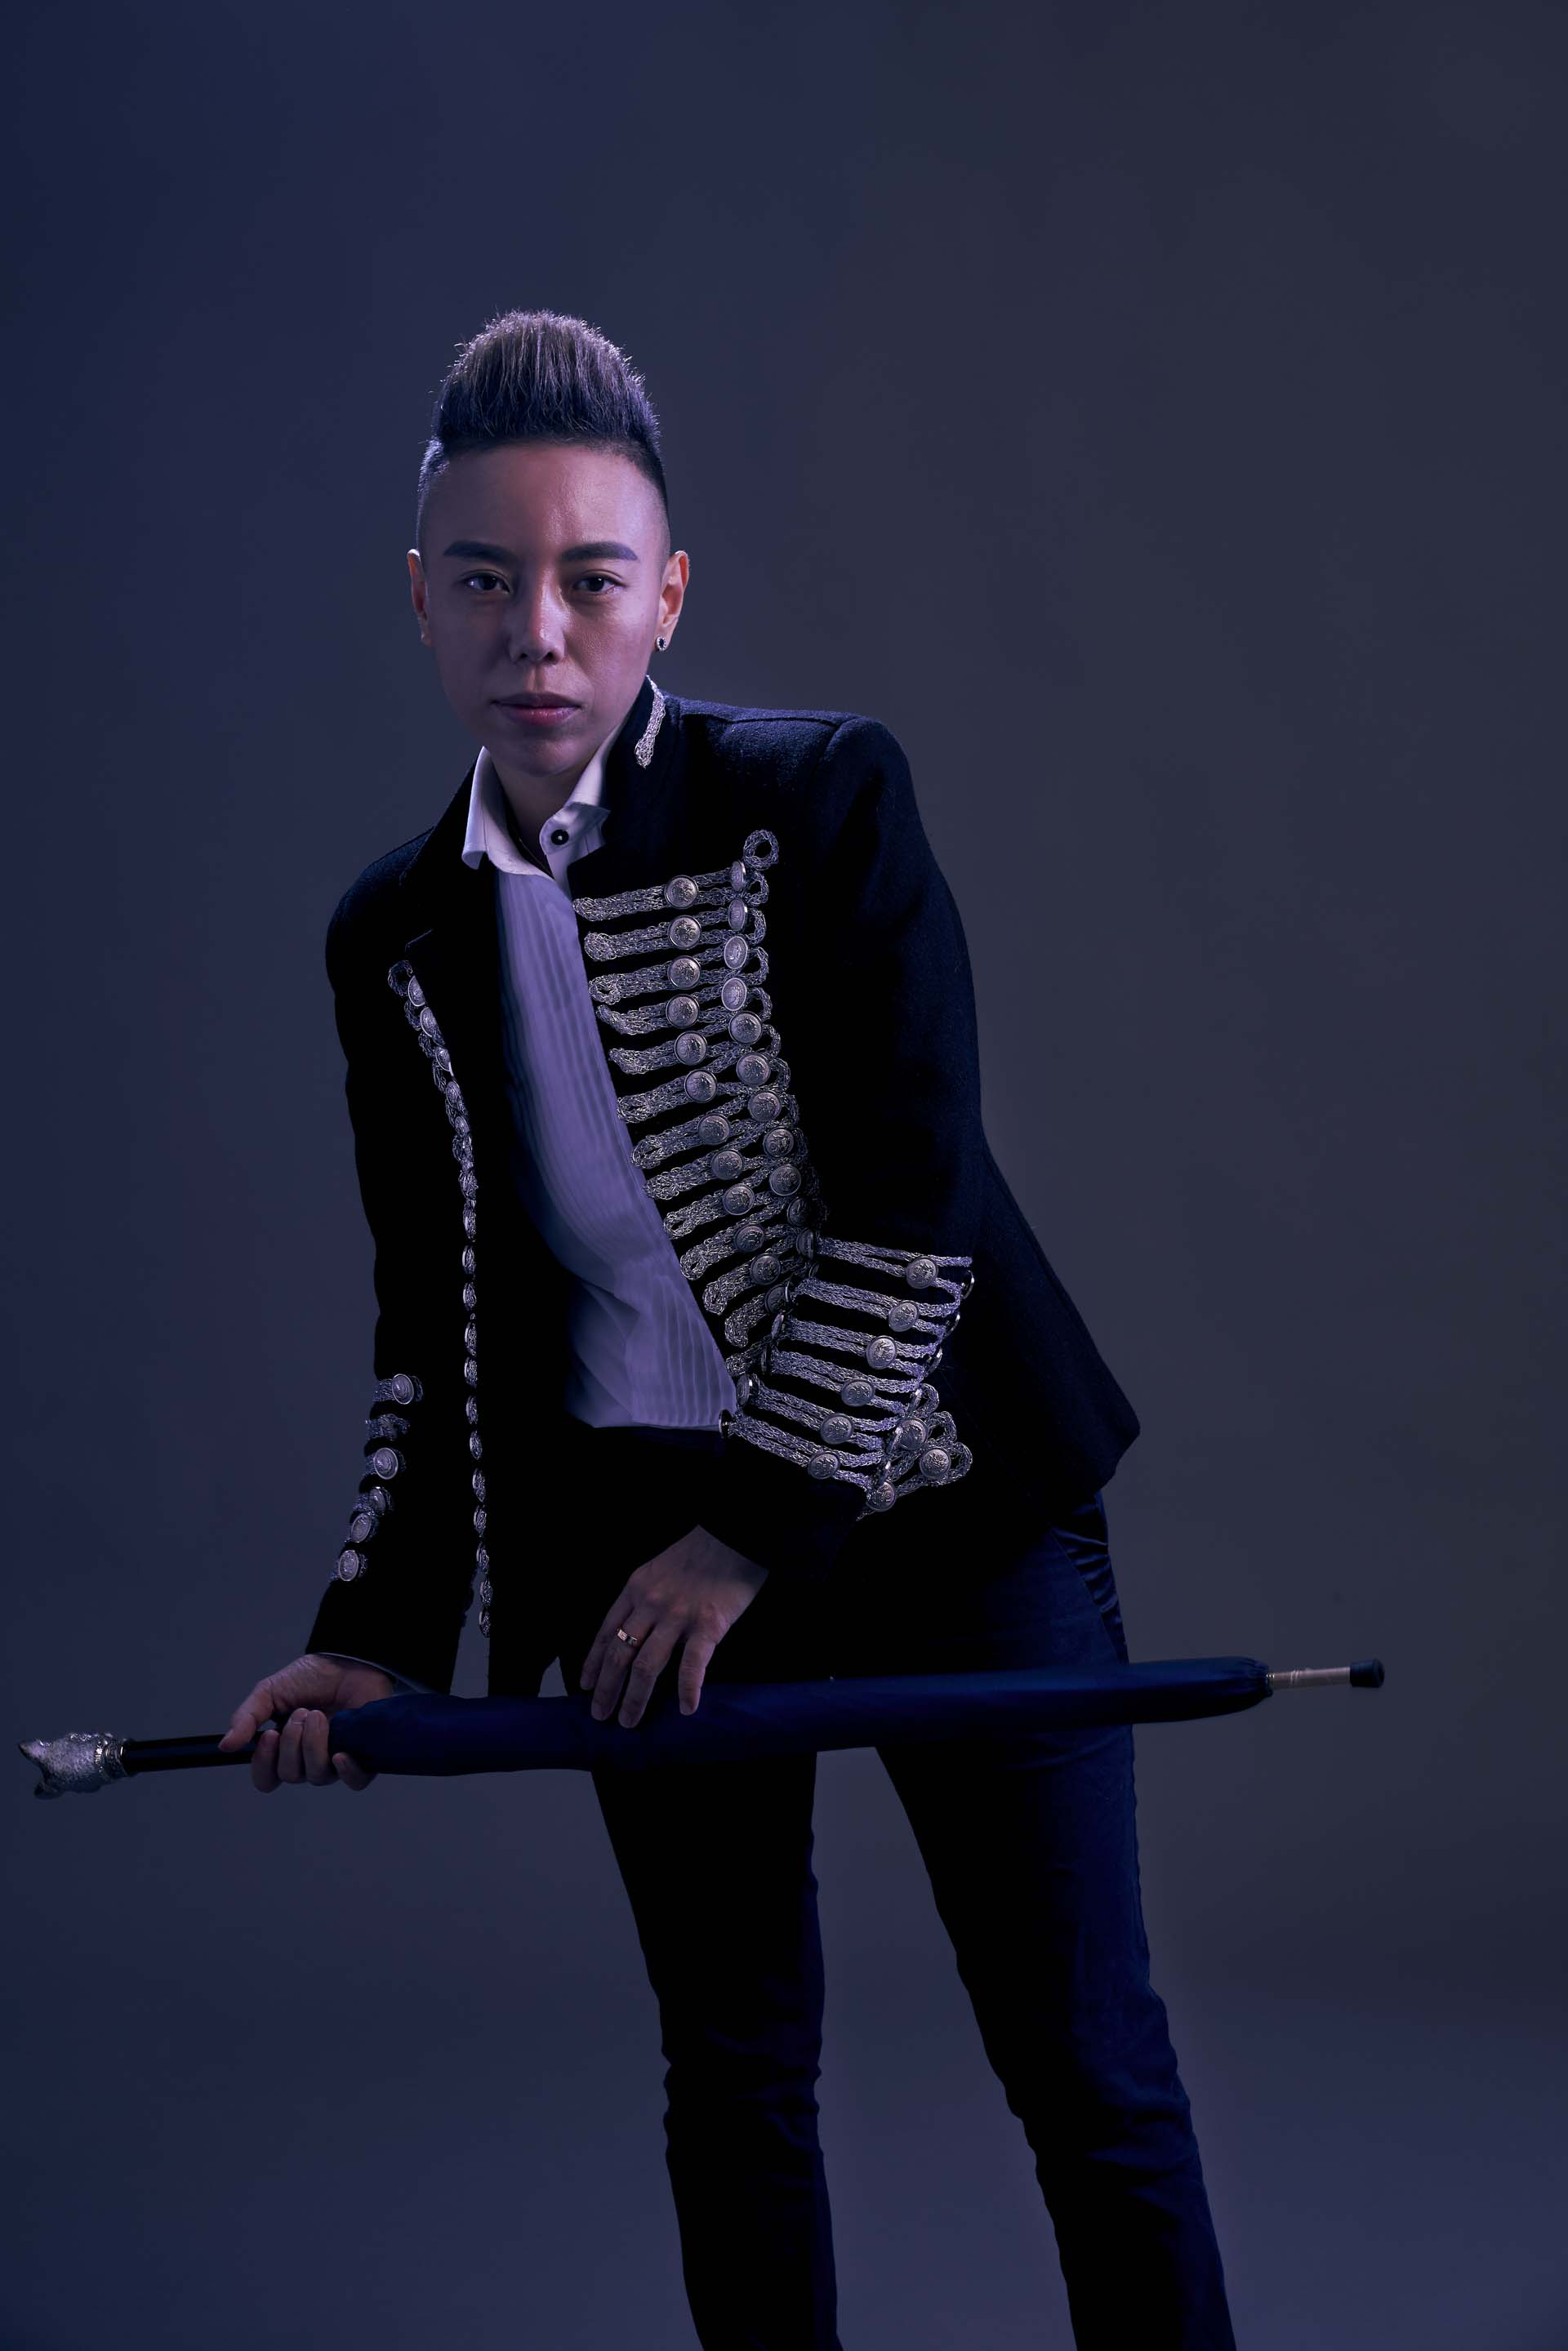 Corporate-Portrait-Photography-Singapore-Johna-49